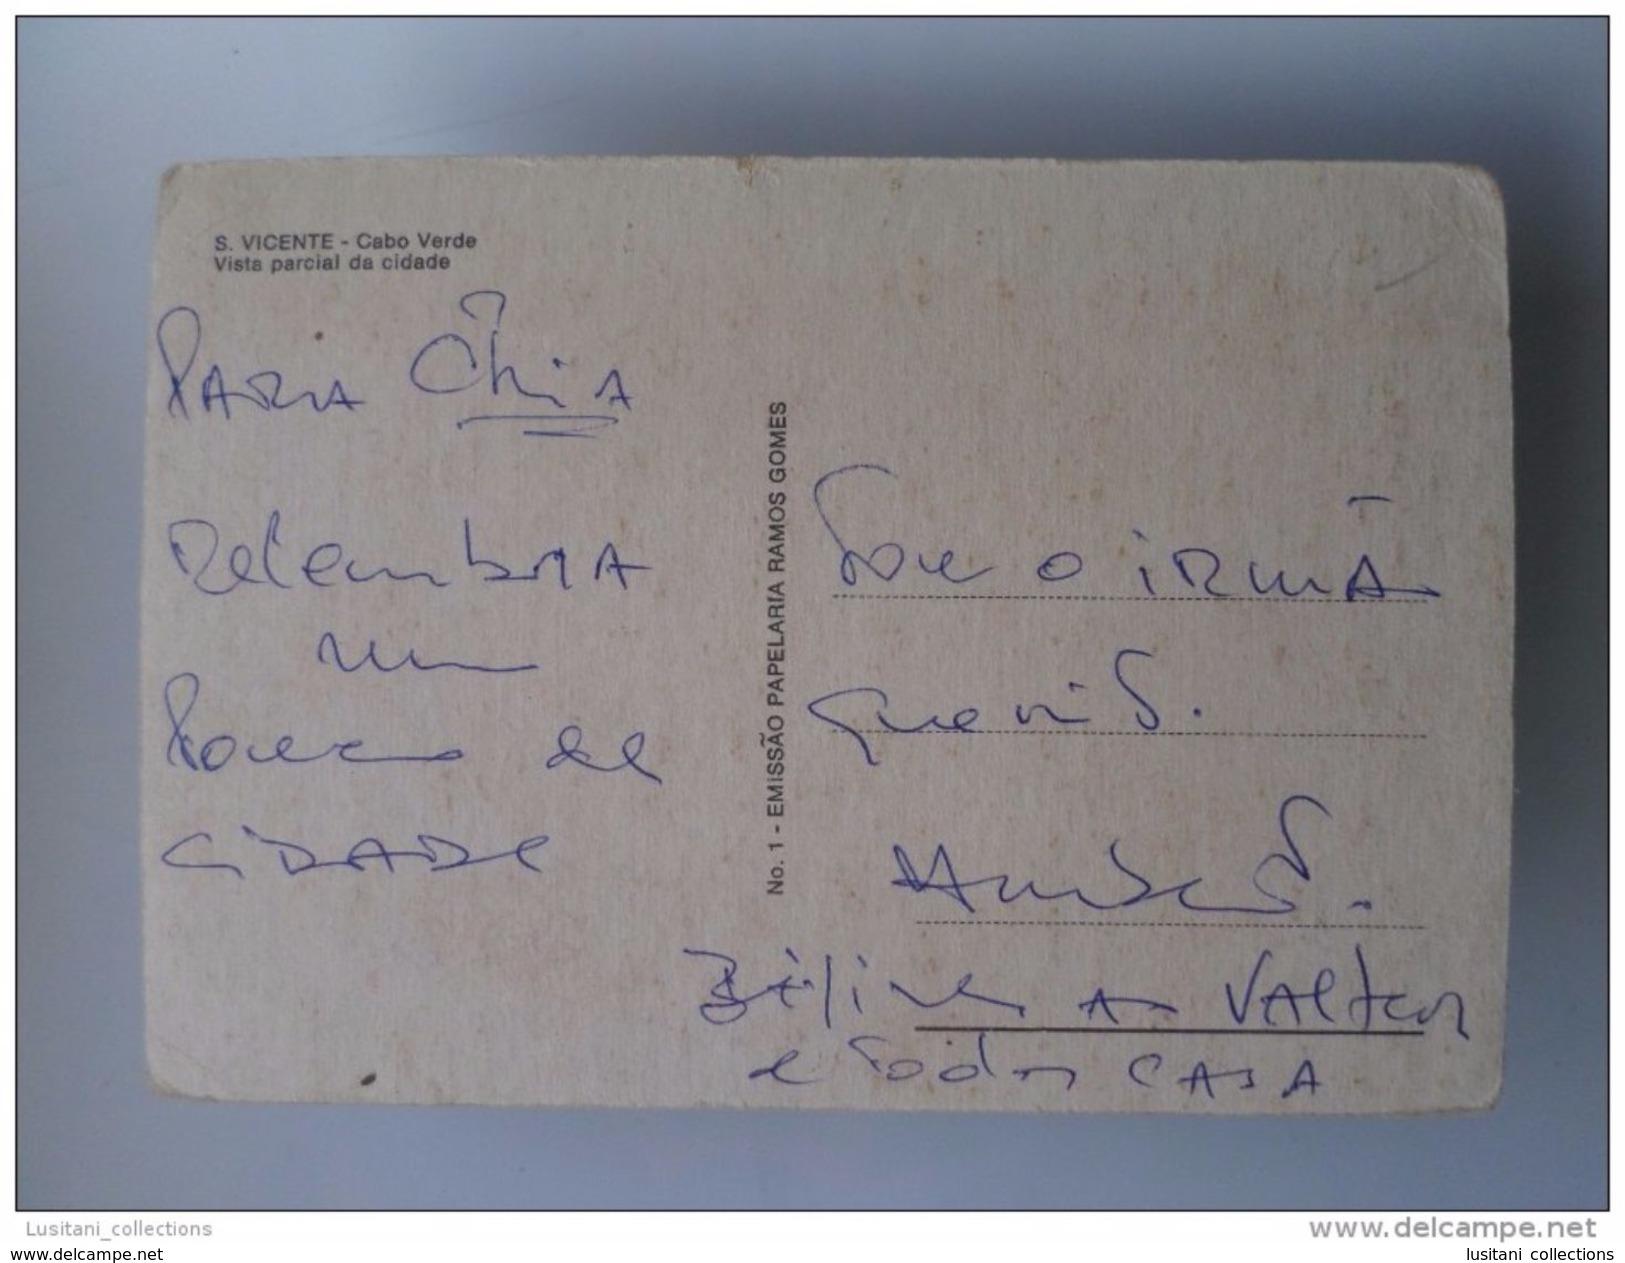 SÃO VICENTE 1960 YEARS AFRICA AFRIKA AFRIQUE CABO VERDE CAPE VERT PARTIAL VIEW POSTCARD - Cap Vert